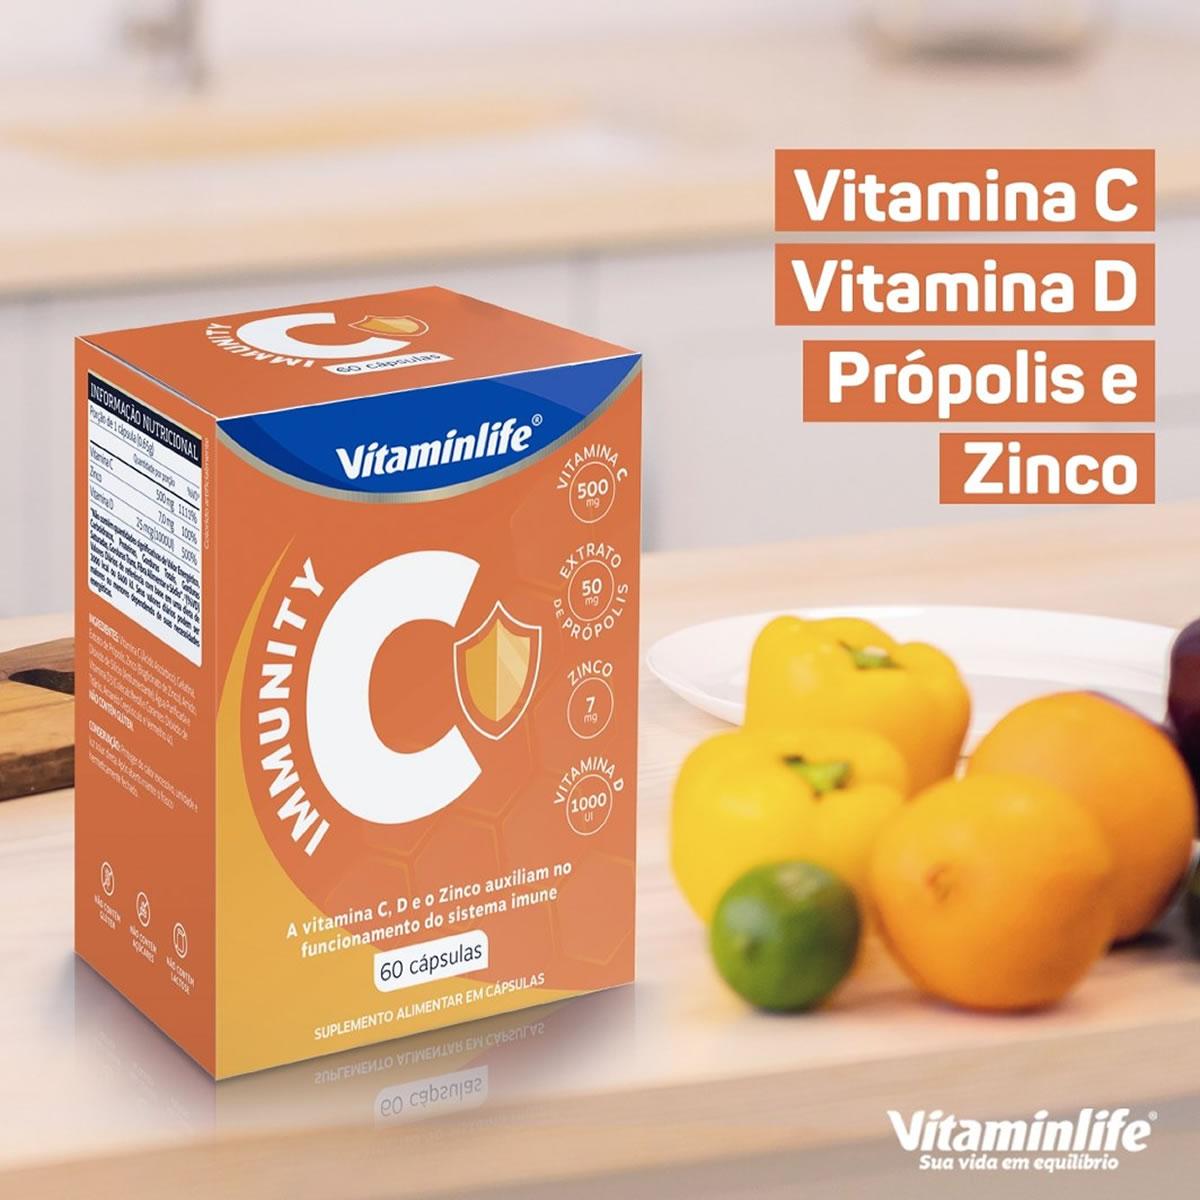 Immunity C Própolis + Vit C+ Zinco + Vit D 60 Cáps - VitaminLife